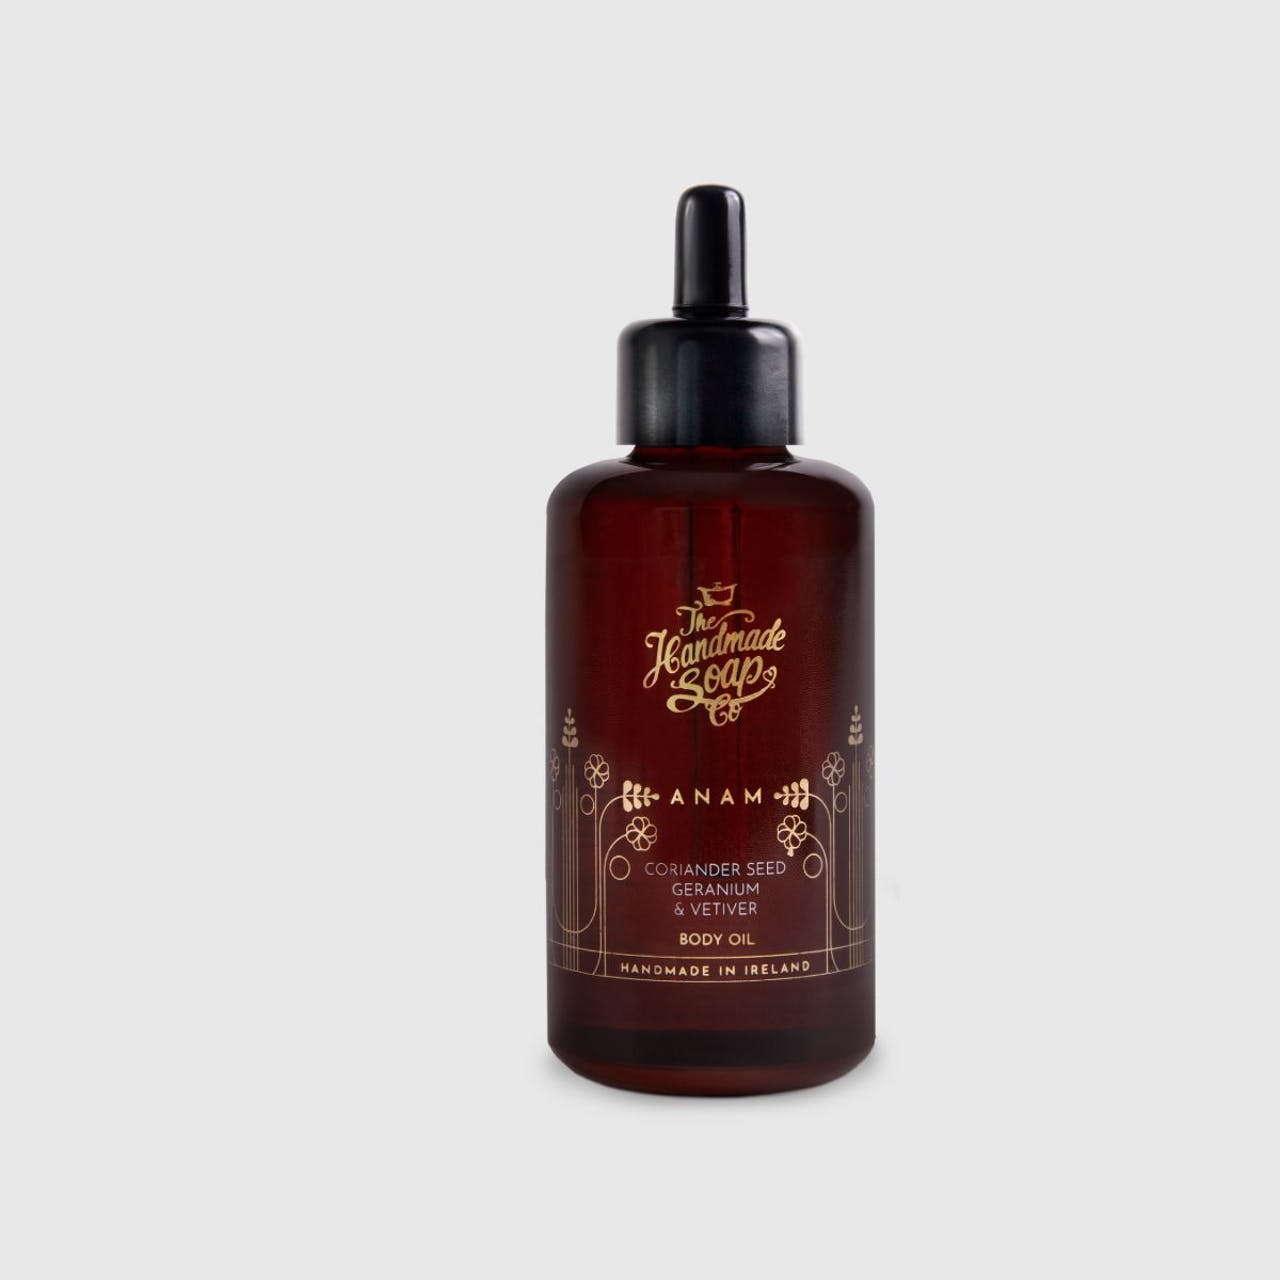 Handmade Soap Company ANAM Coriander Seed, Geranium & Vetiver Body Oil